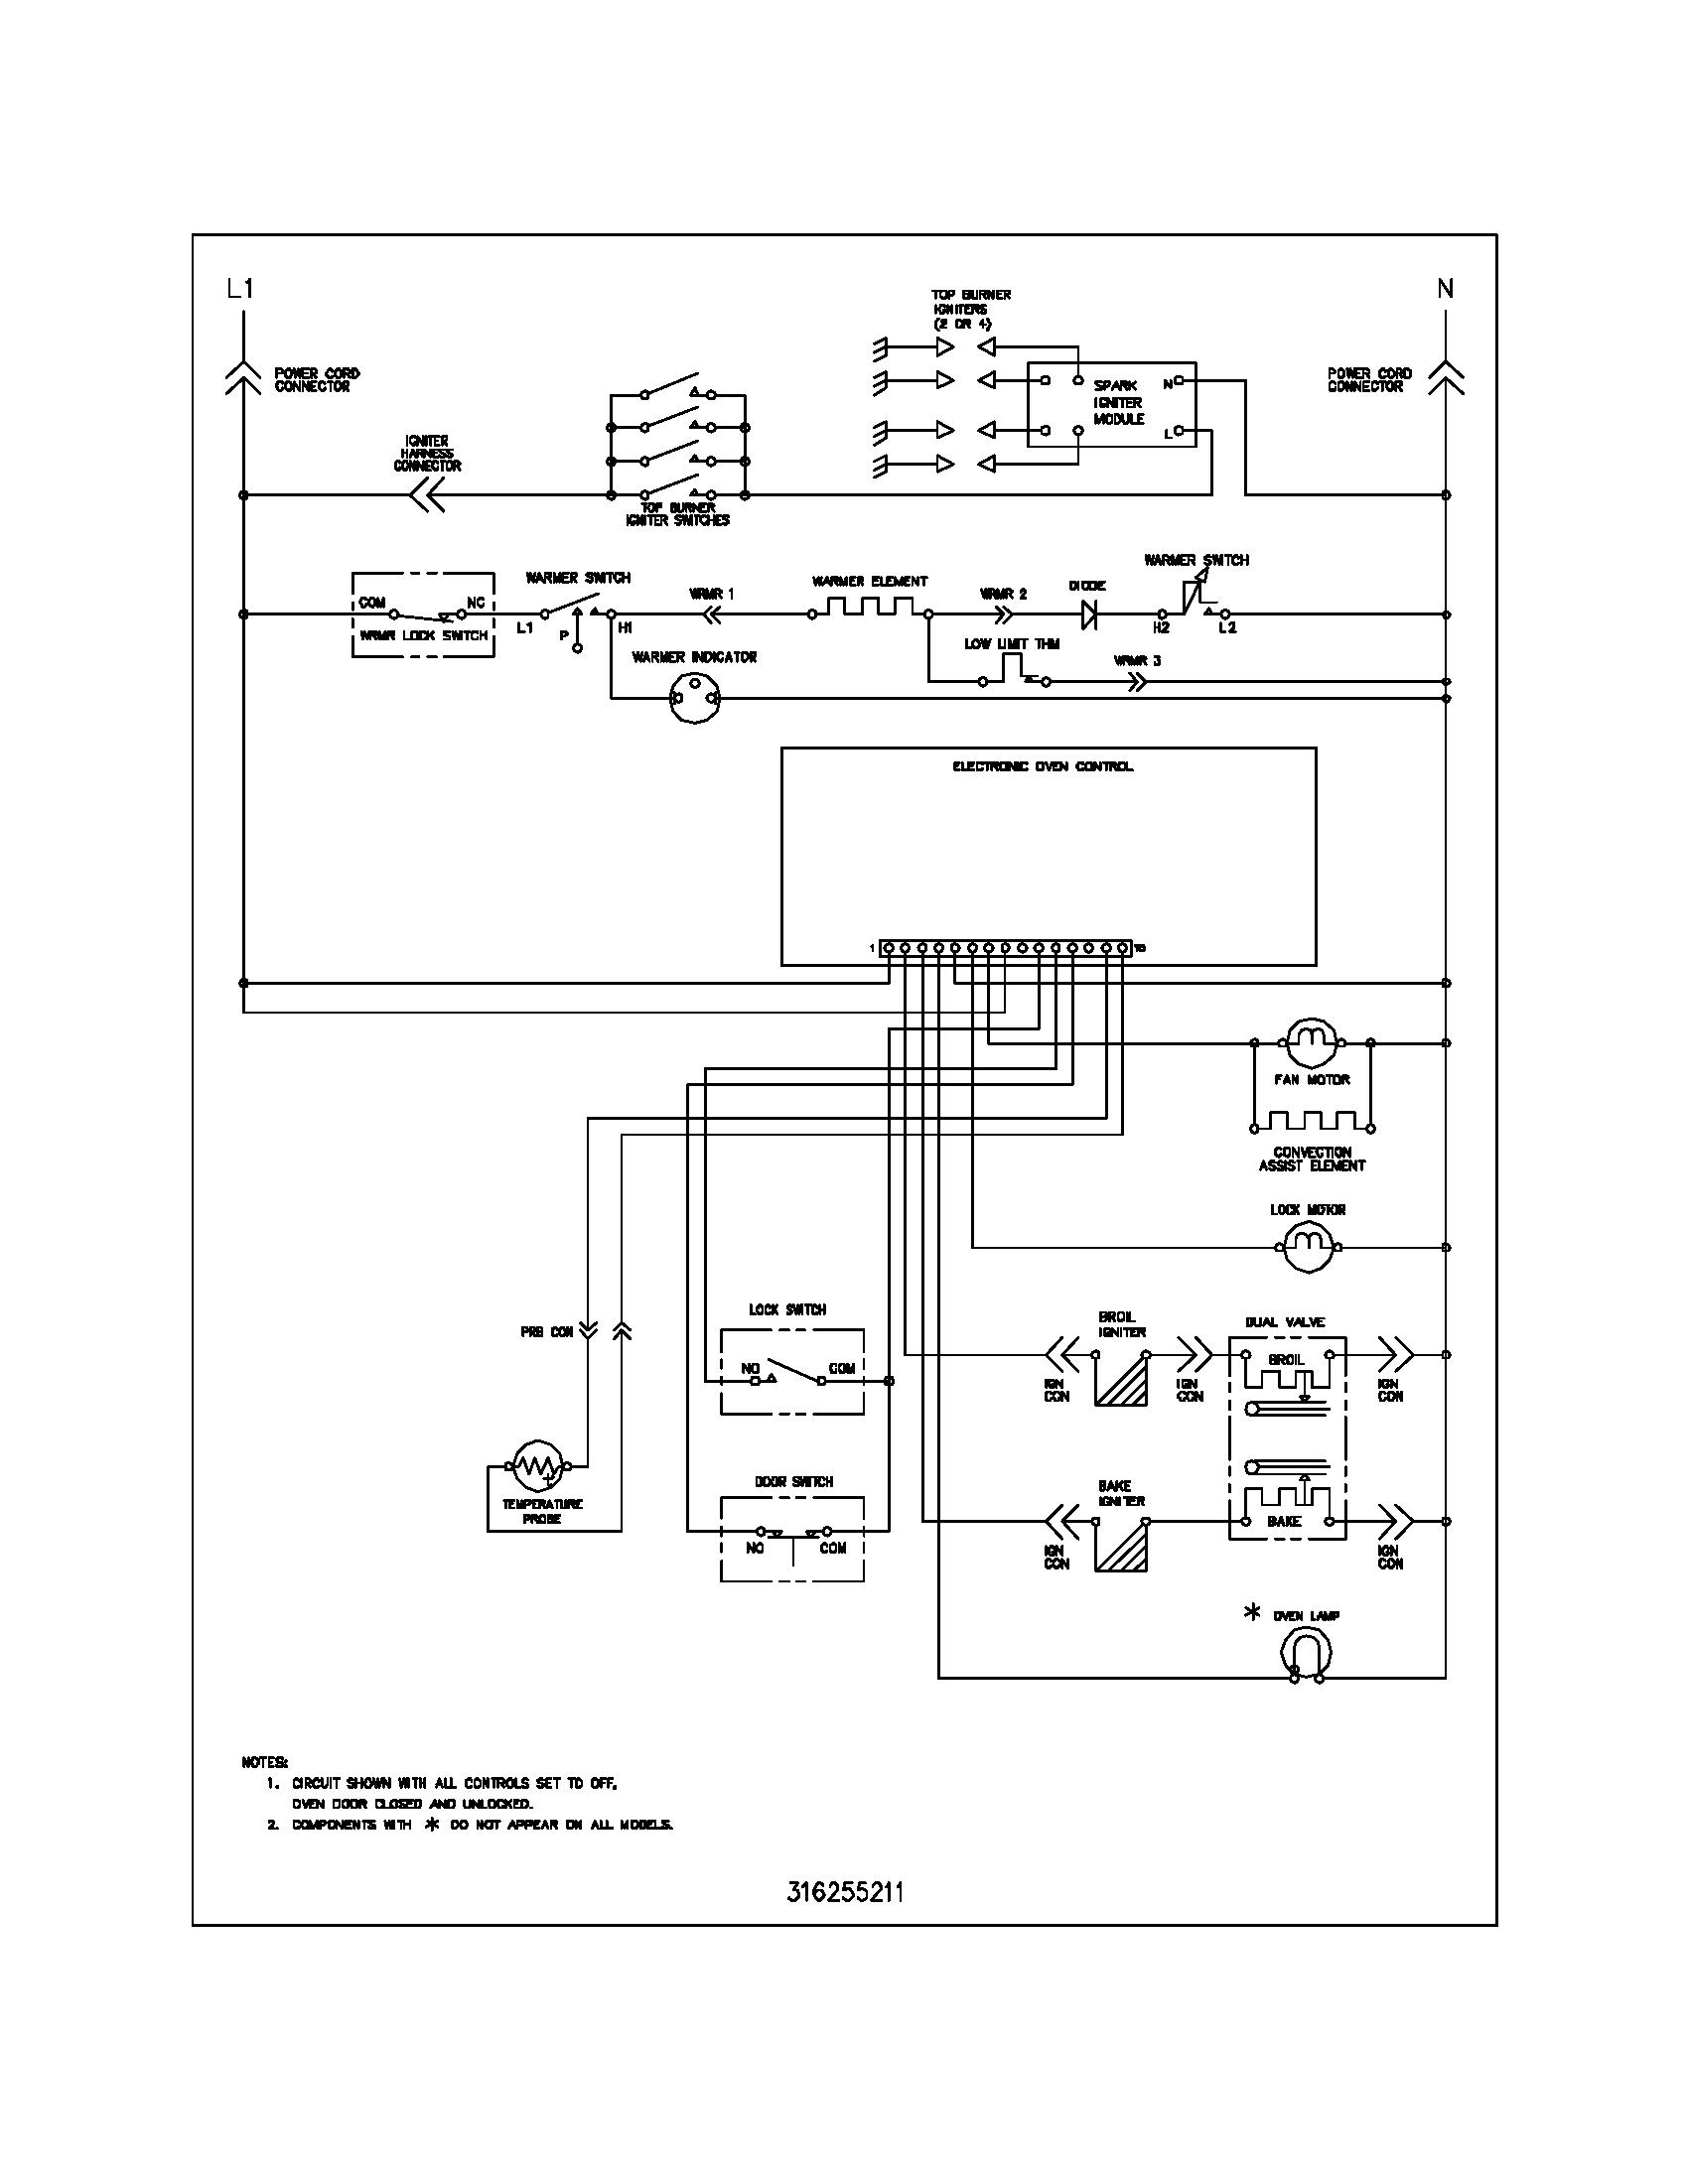 medium resolution of firep heater wiring diagram wiring diagram blog 16 wiring diagram for electric fireplace heater wiring diagram